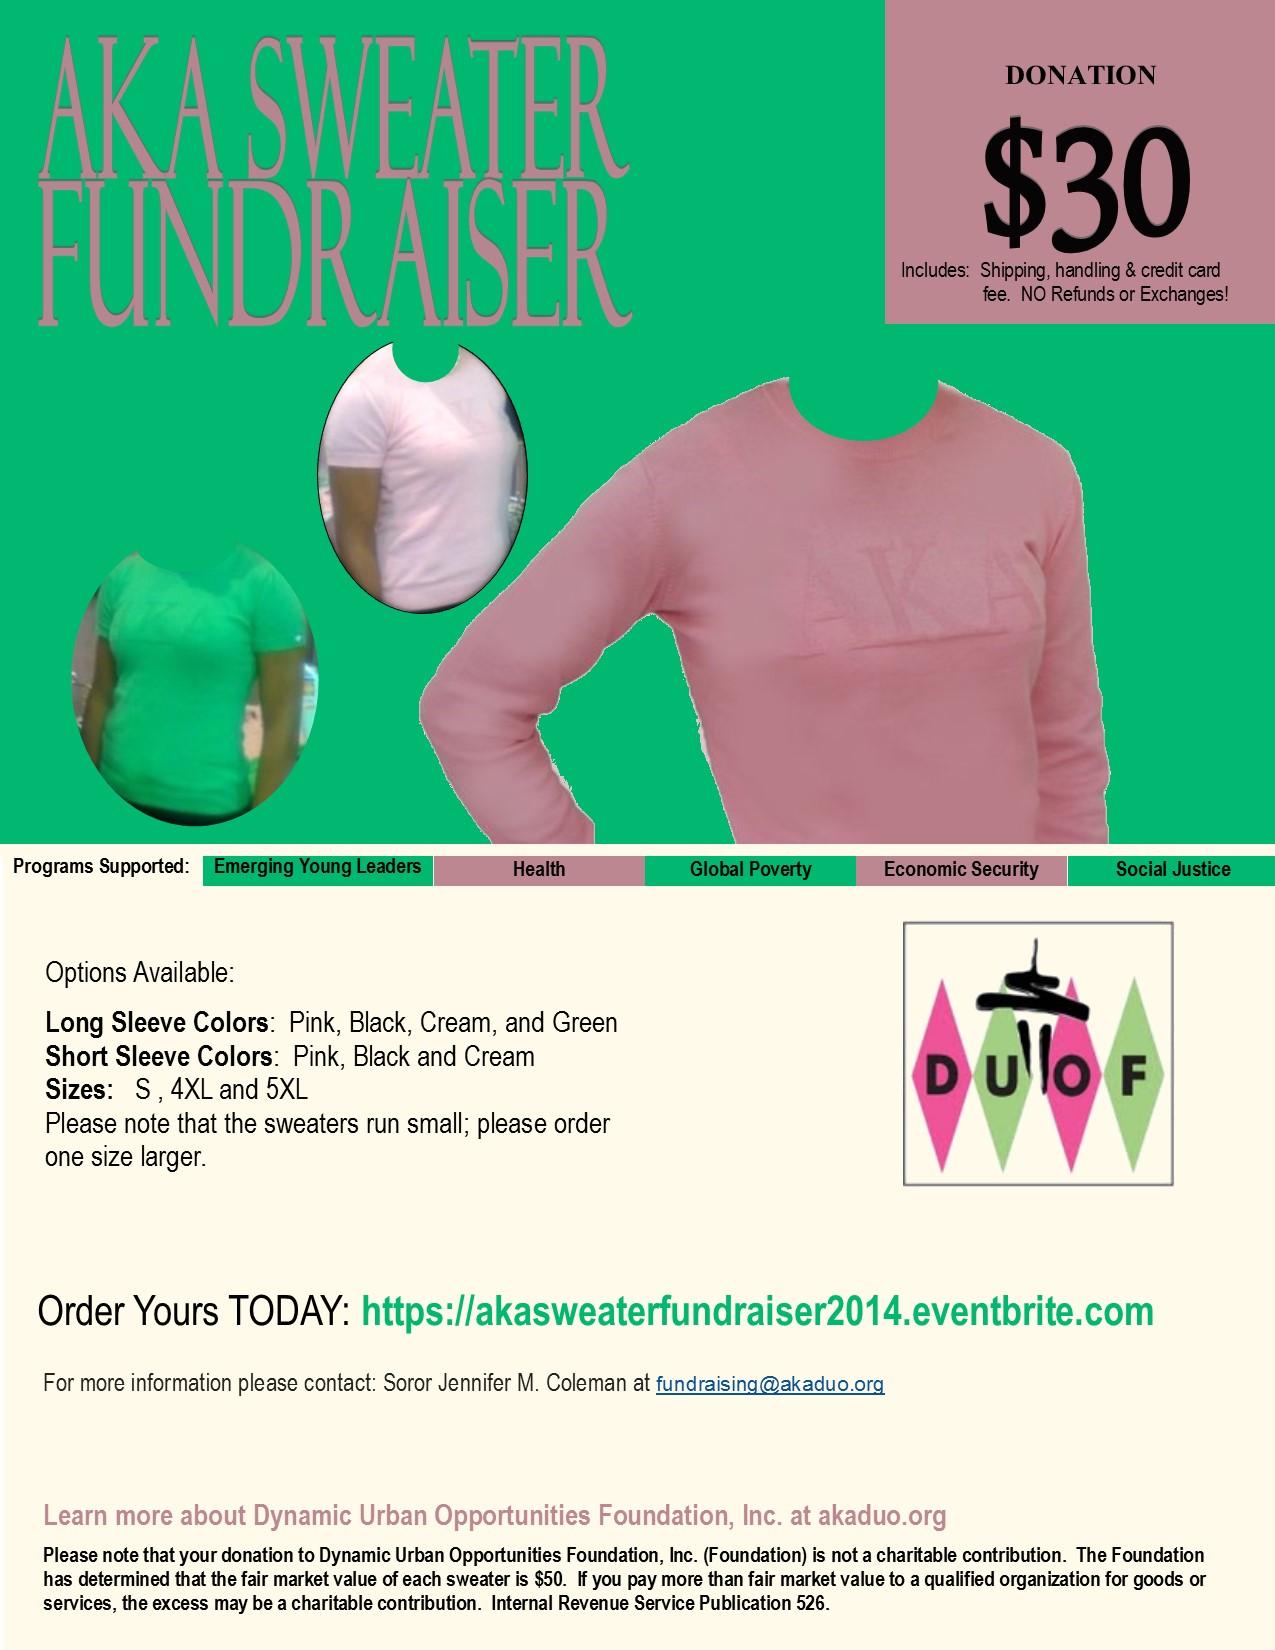 AKA Sweater Fundraiser 2014